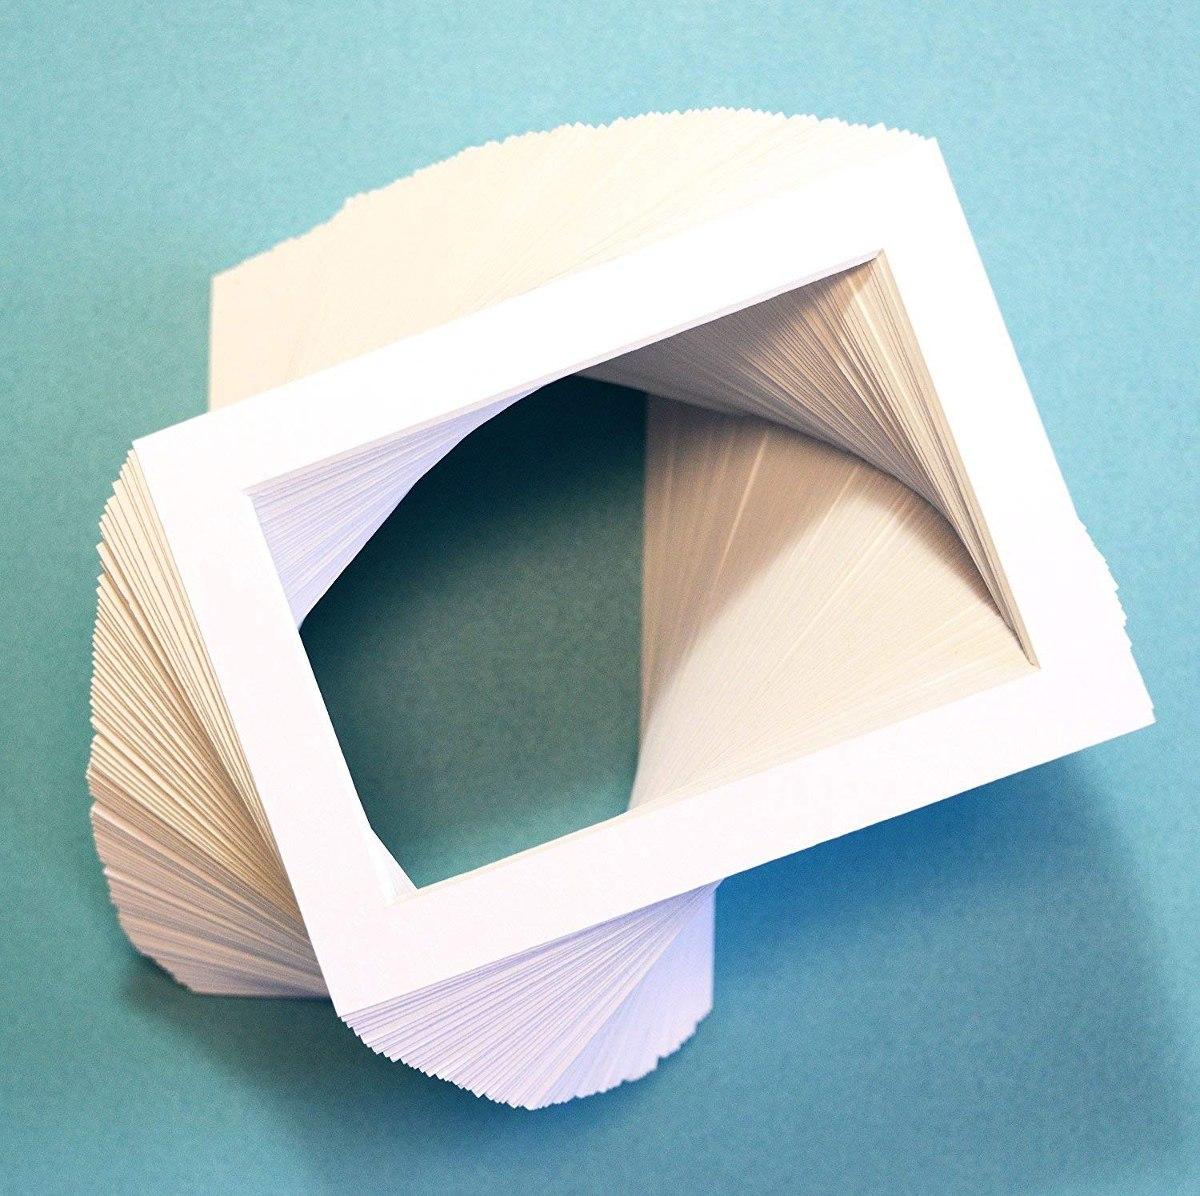 Pack De 100 Juegos De 5x7 Fo Blanco Imagen Mats Estera Matte ...